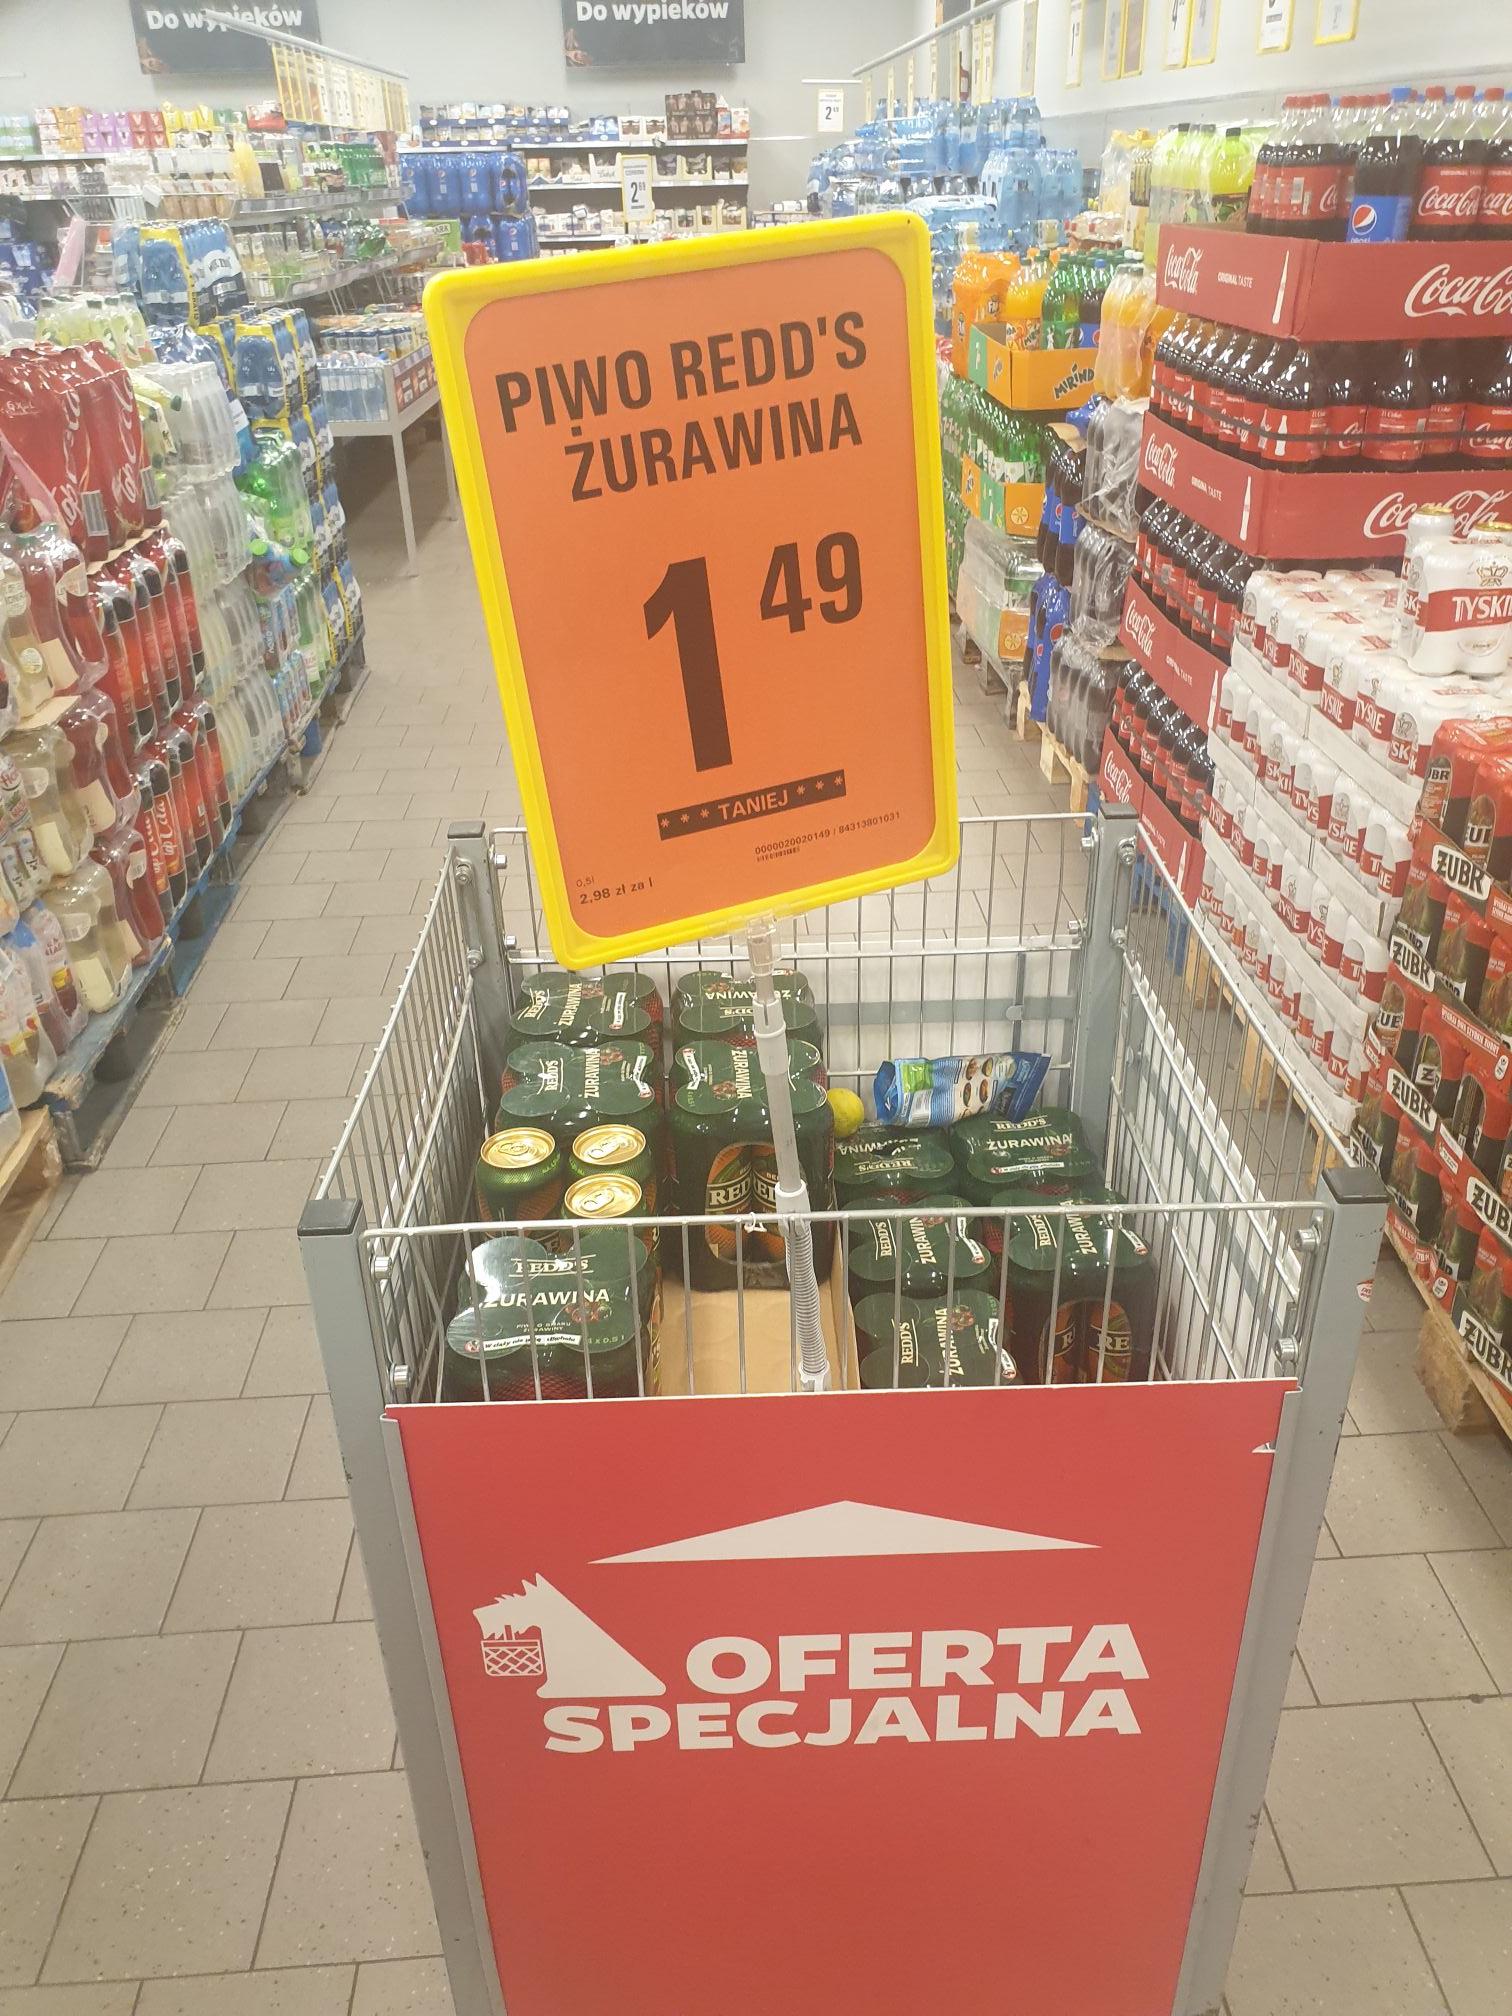 Redd's Piwo o smaku żurawiny 500 ml   NETTO WARSZAWA BERENSONA